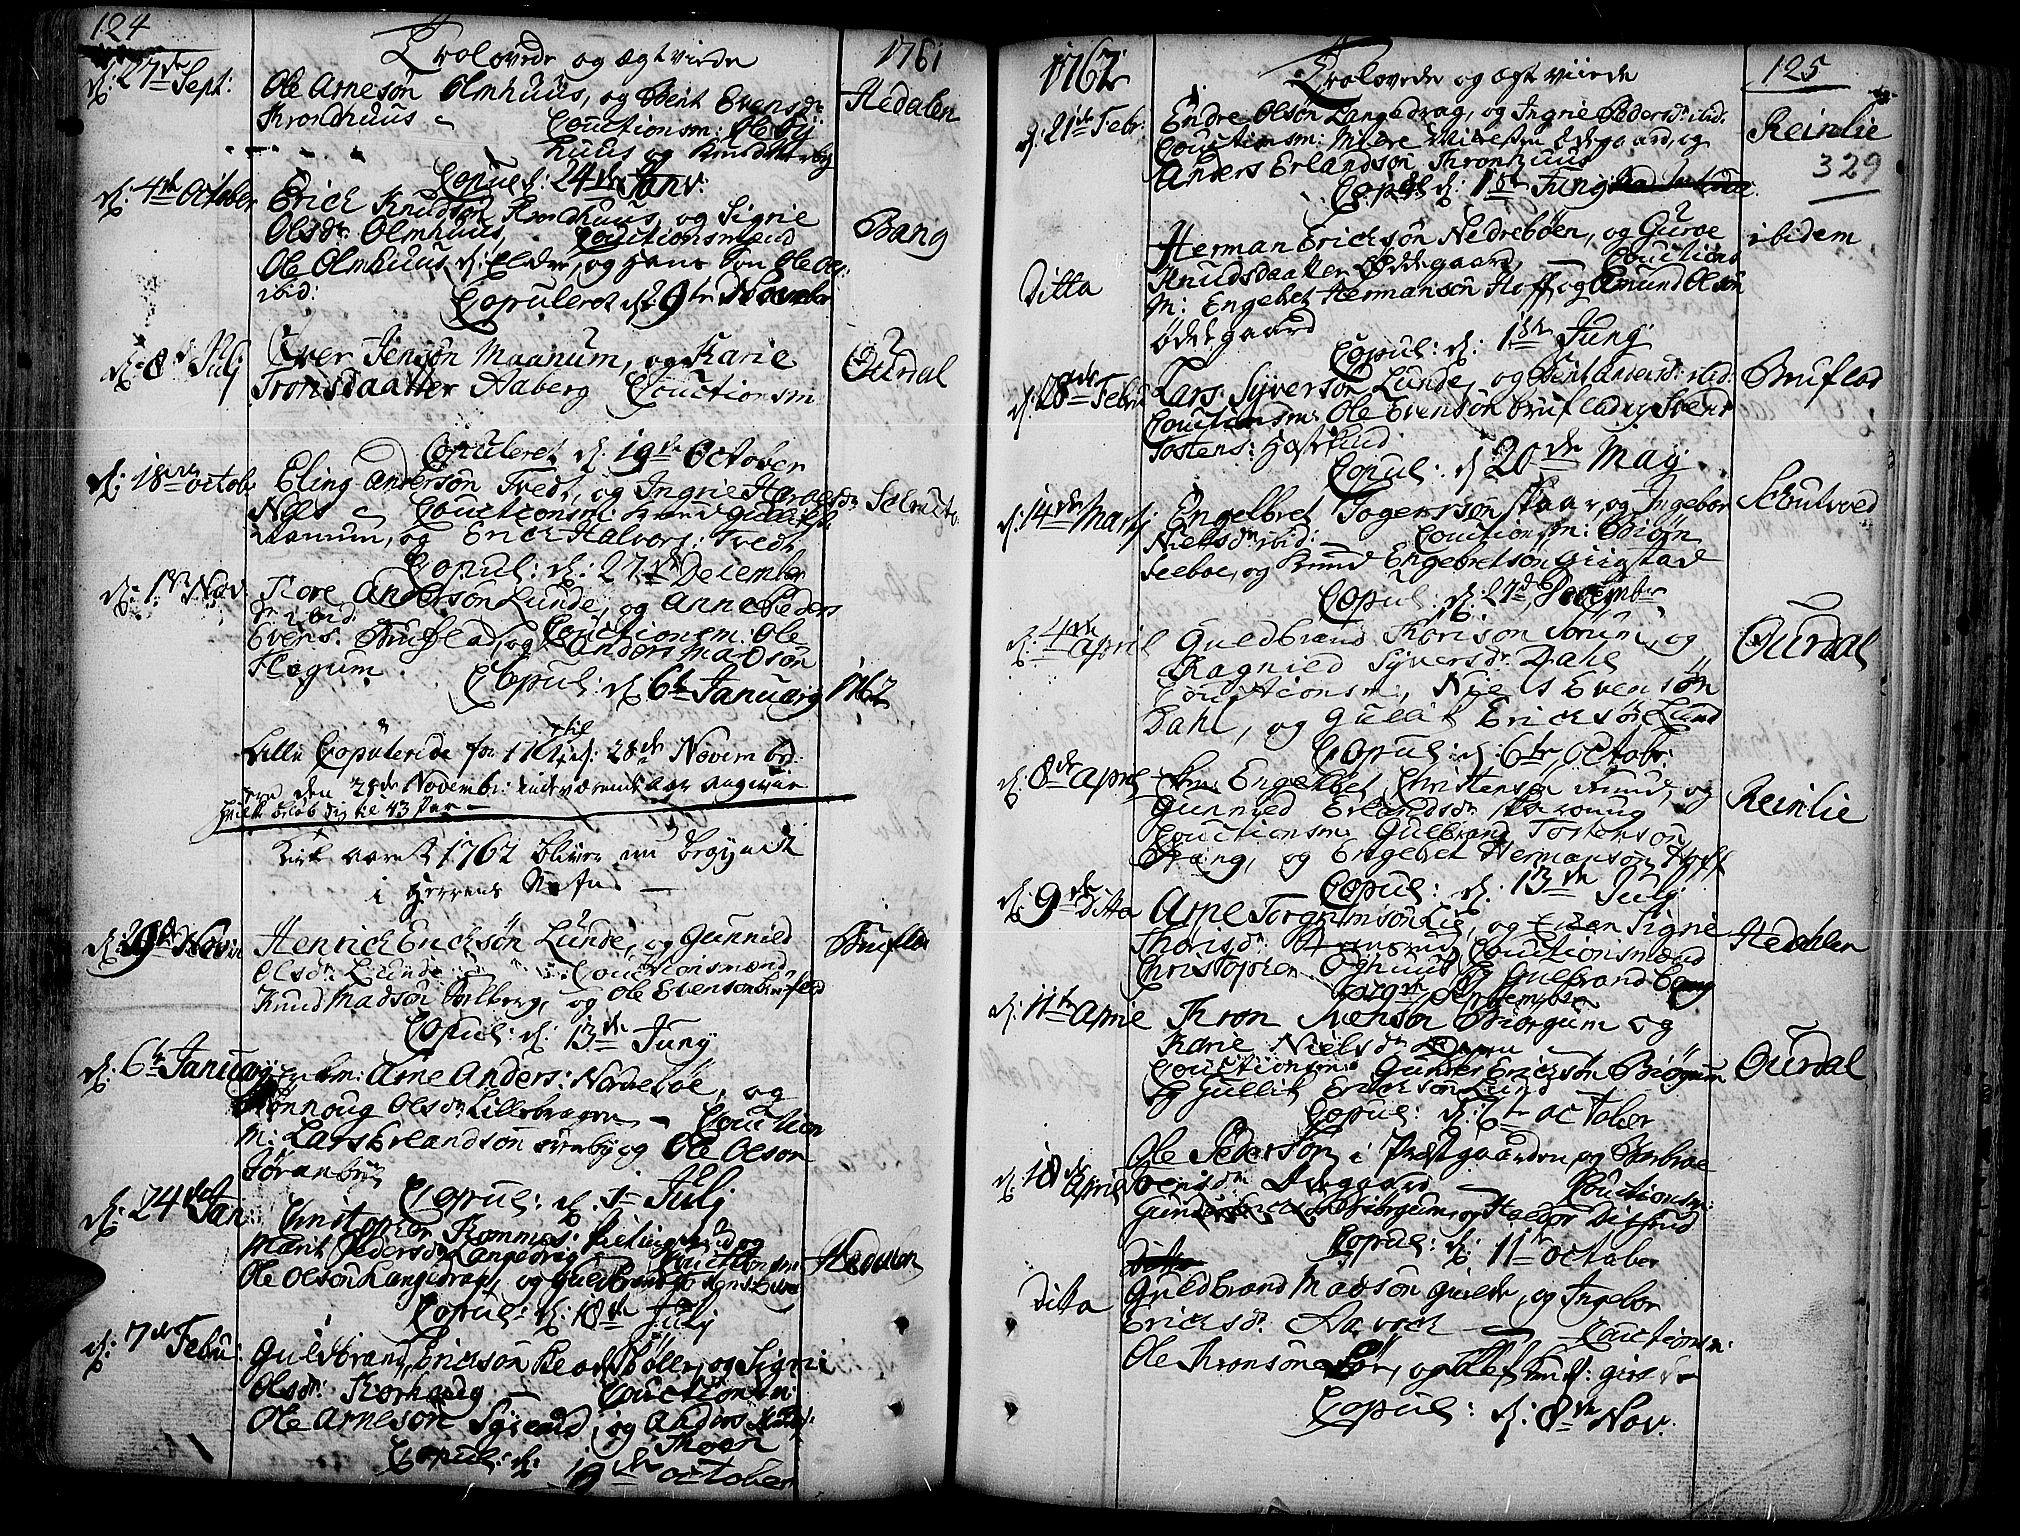 SAH, Aurdal prestekontor, Ministerialbok nr. 4, 1730-1762, s. 124-125